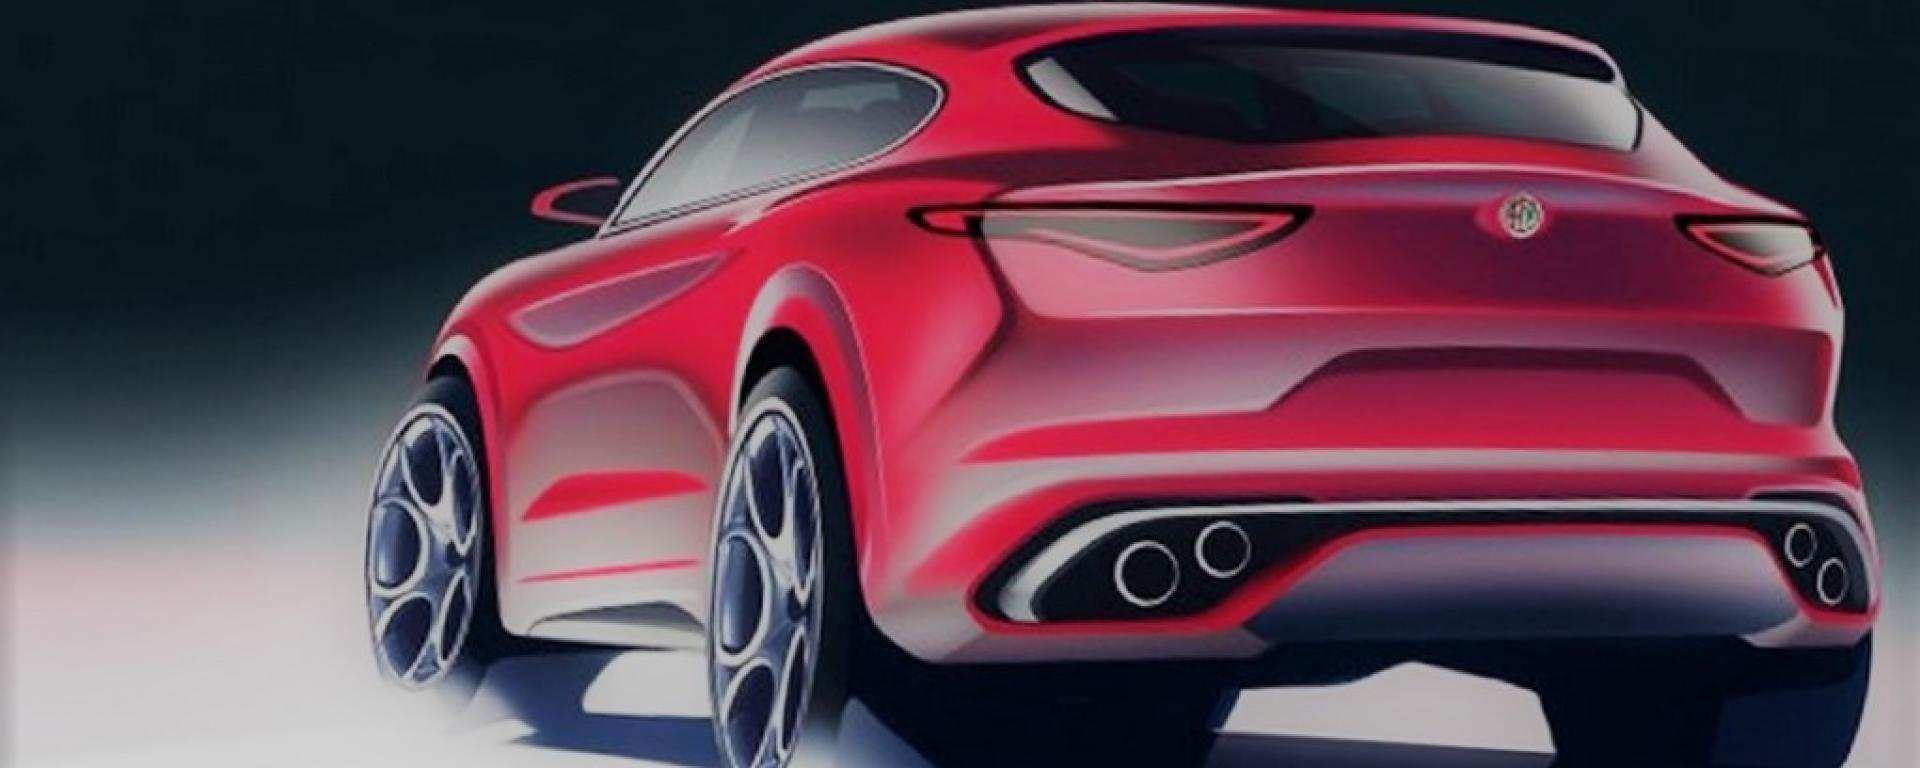 41 Great 2019 Alfa Romeo Giulietta Release Date by 2019 Alfa Romeo Giulietta